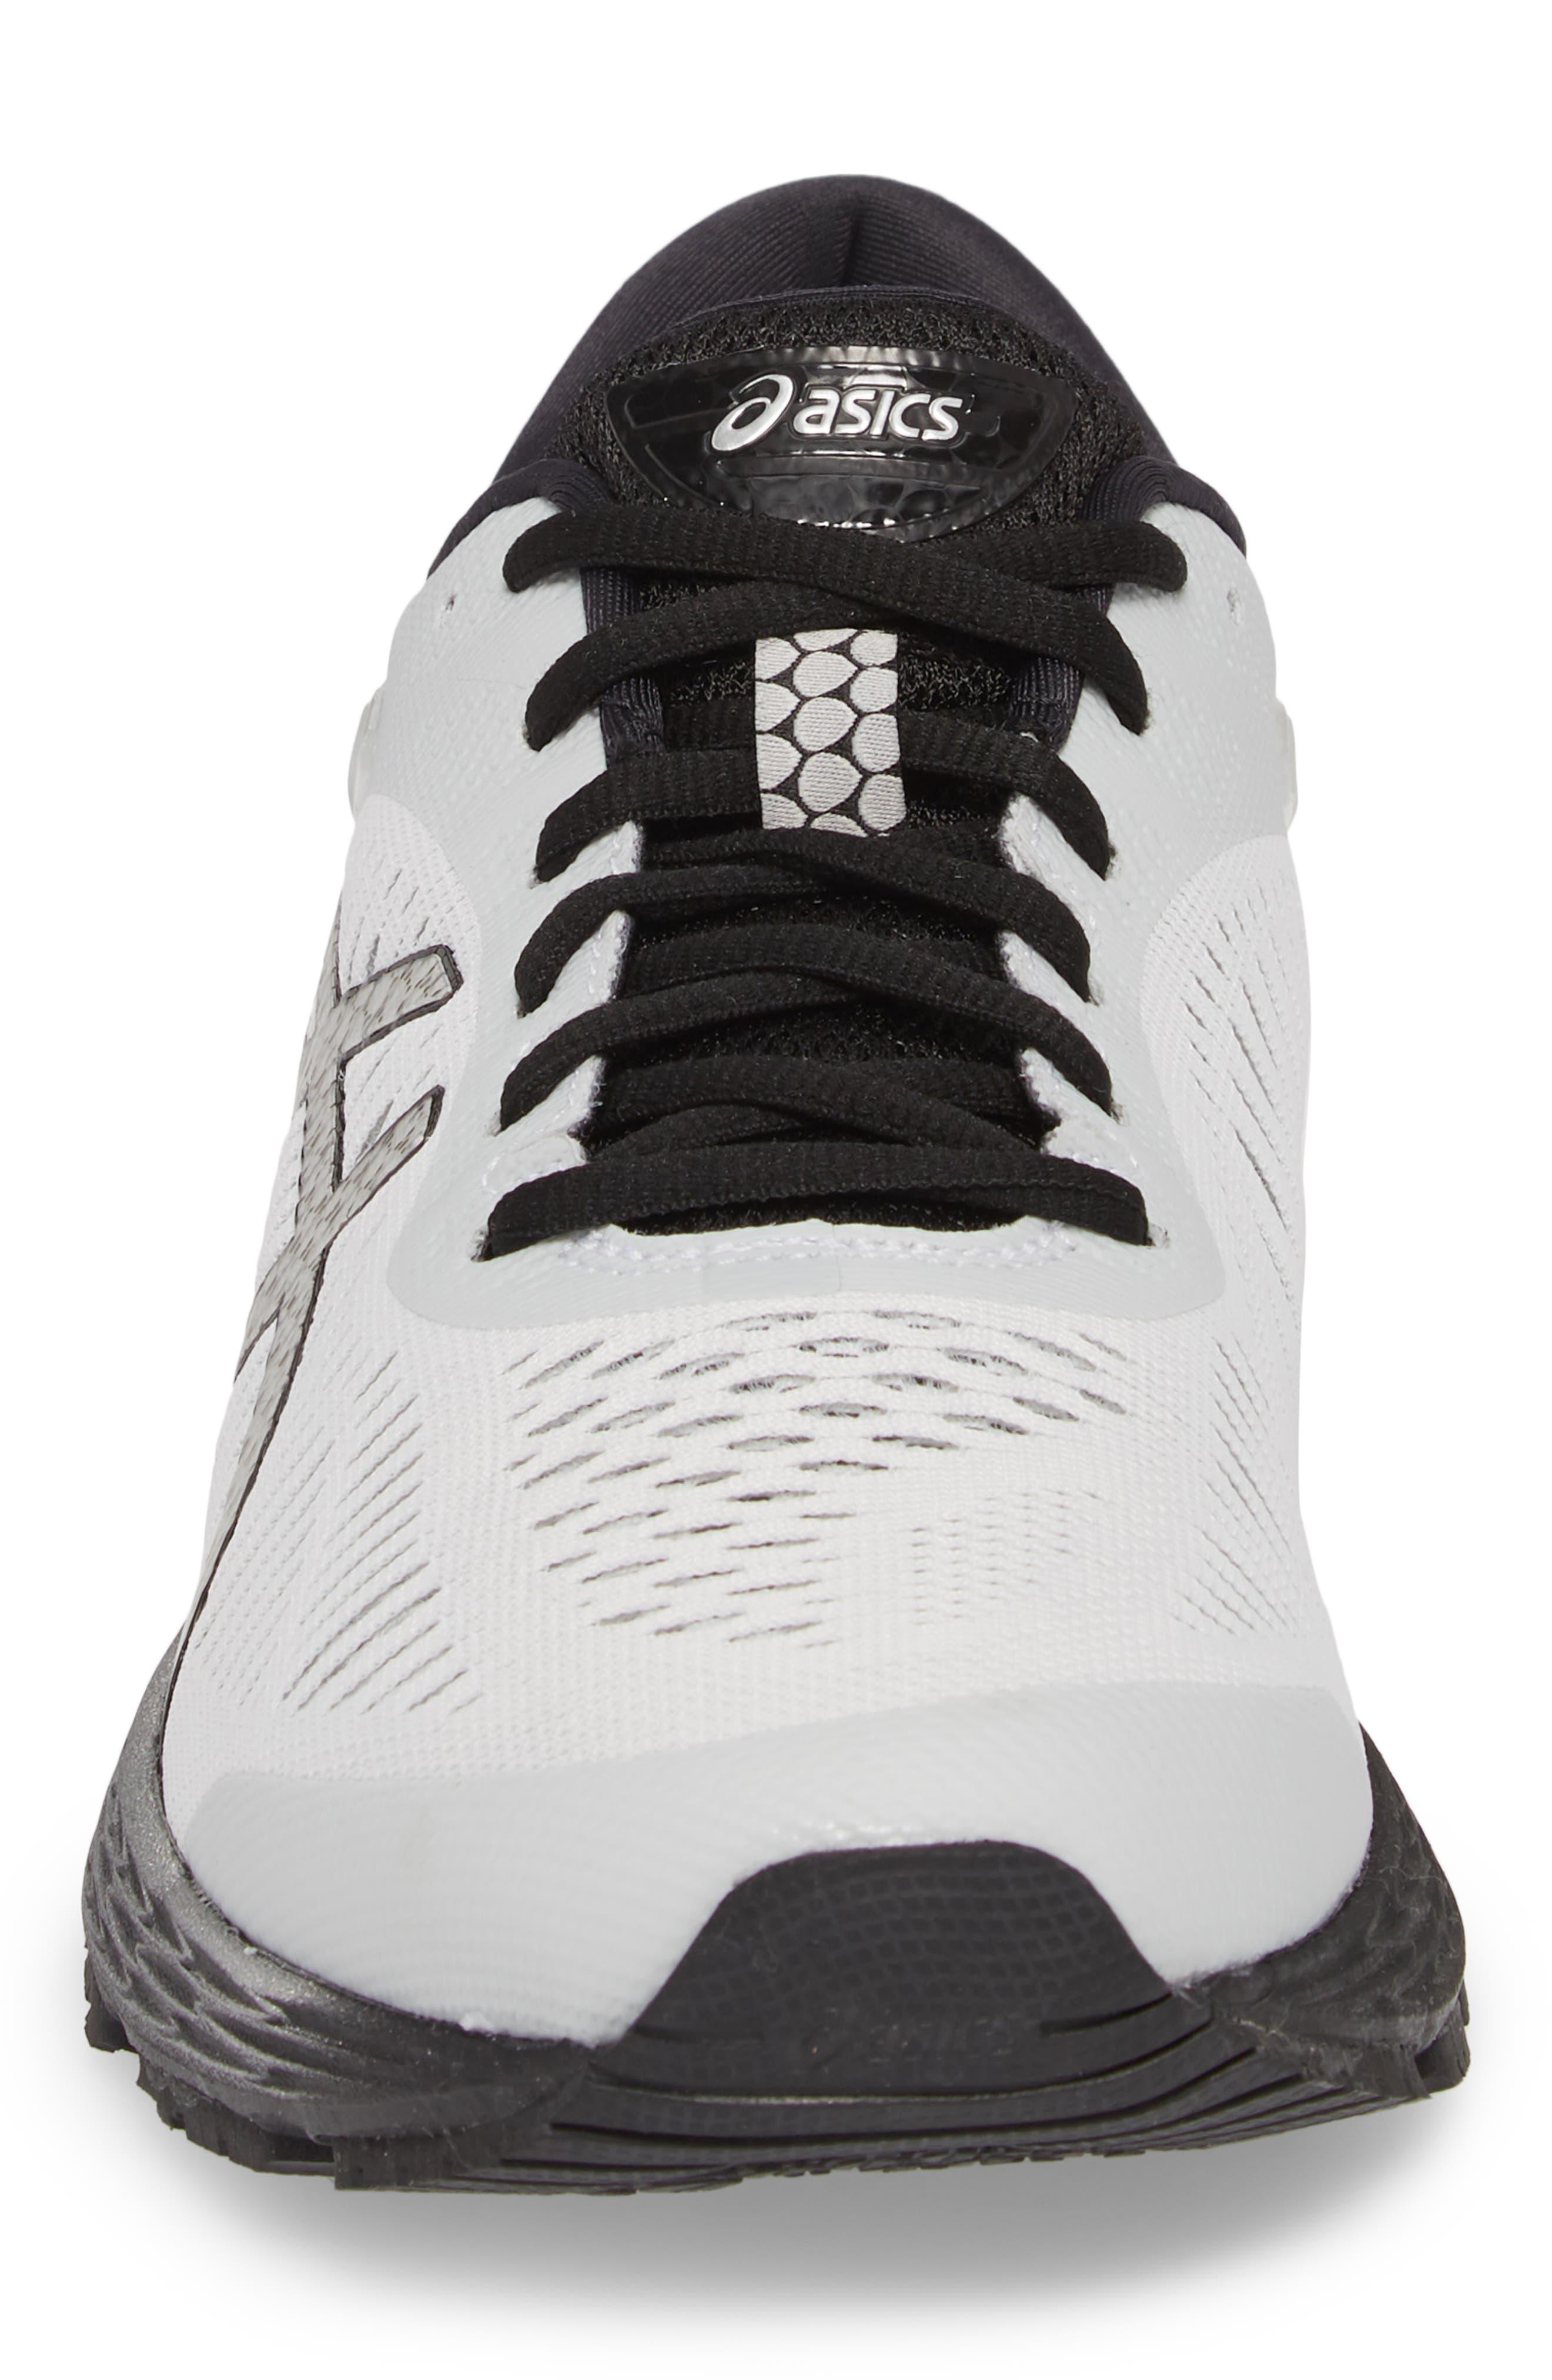 GEL-Kayano<sup>®</sup> 25 Running Shoe,                             Alternate thumbnail 4, color,                             GLACIER GREY/ BLACK